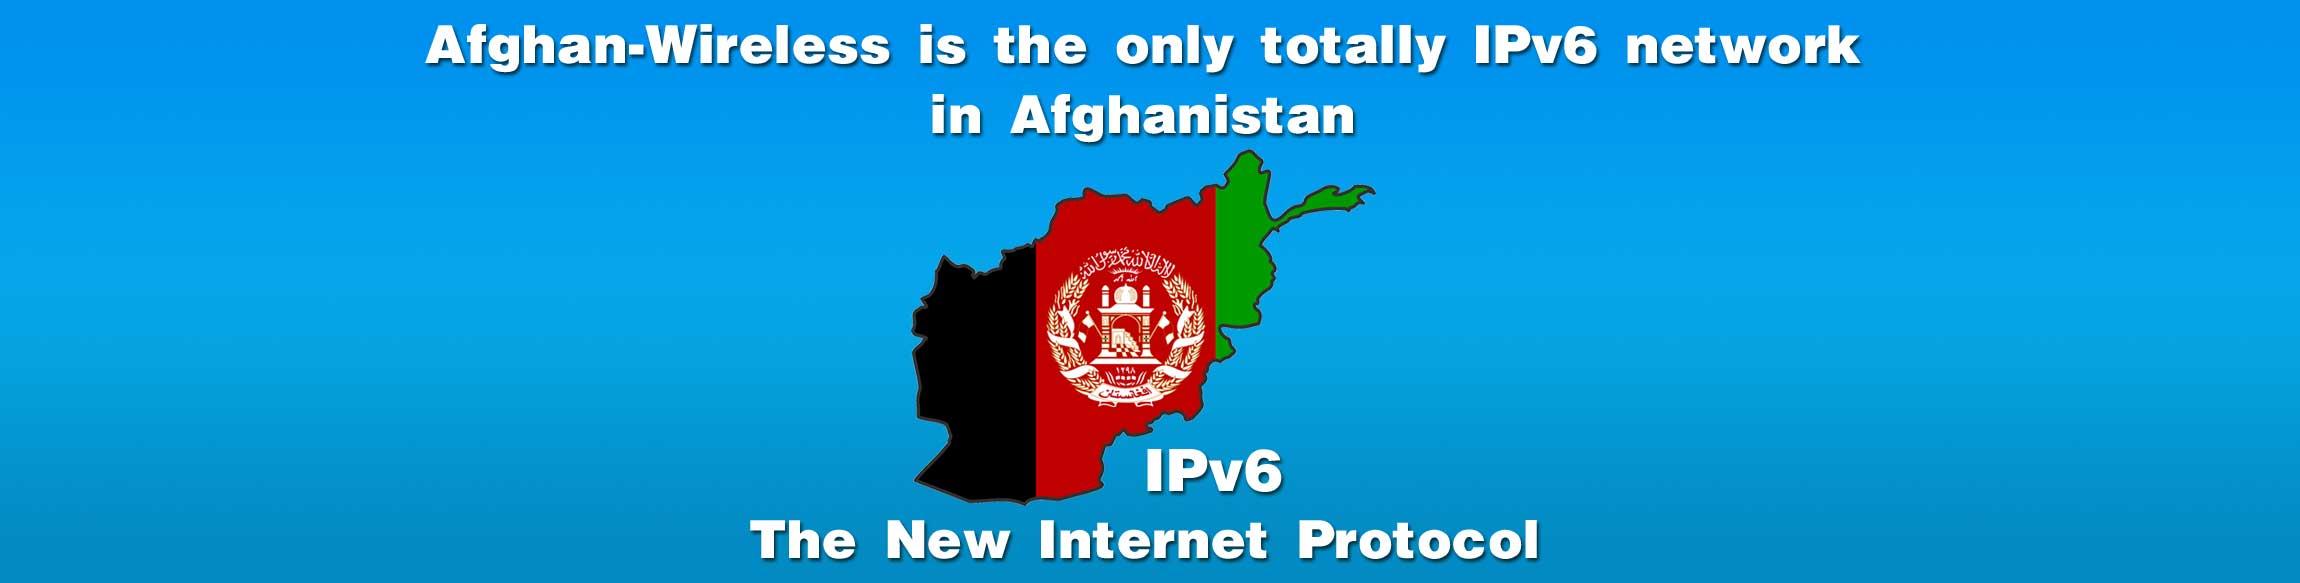 AWCC-IPv6